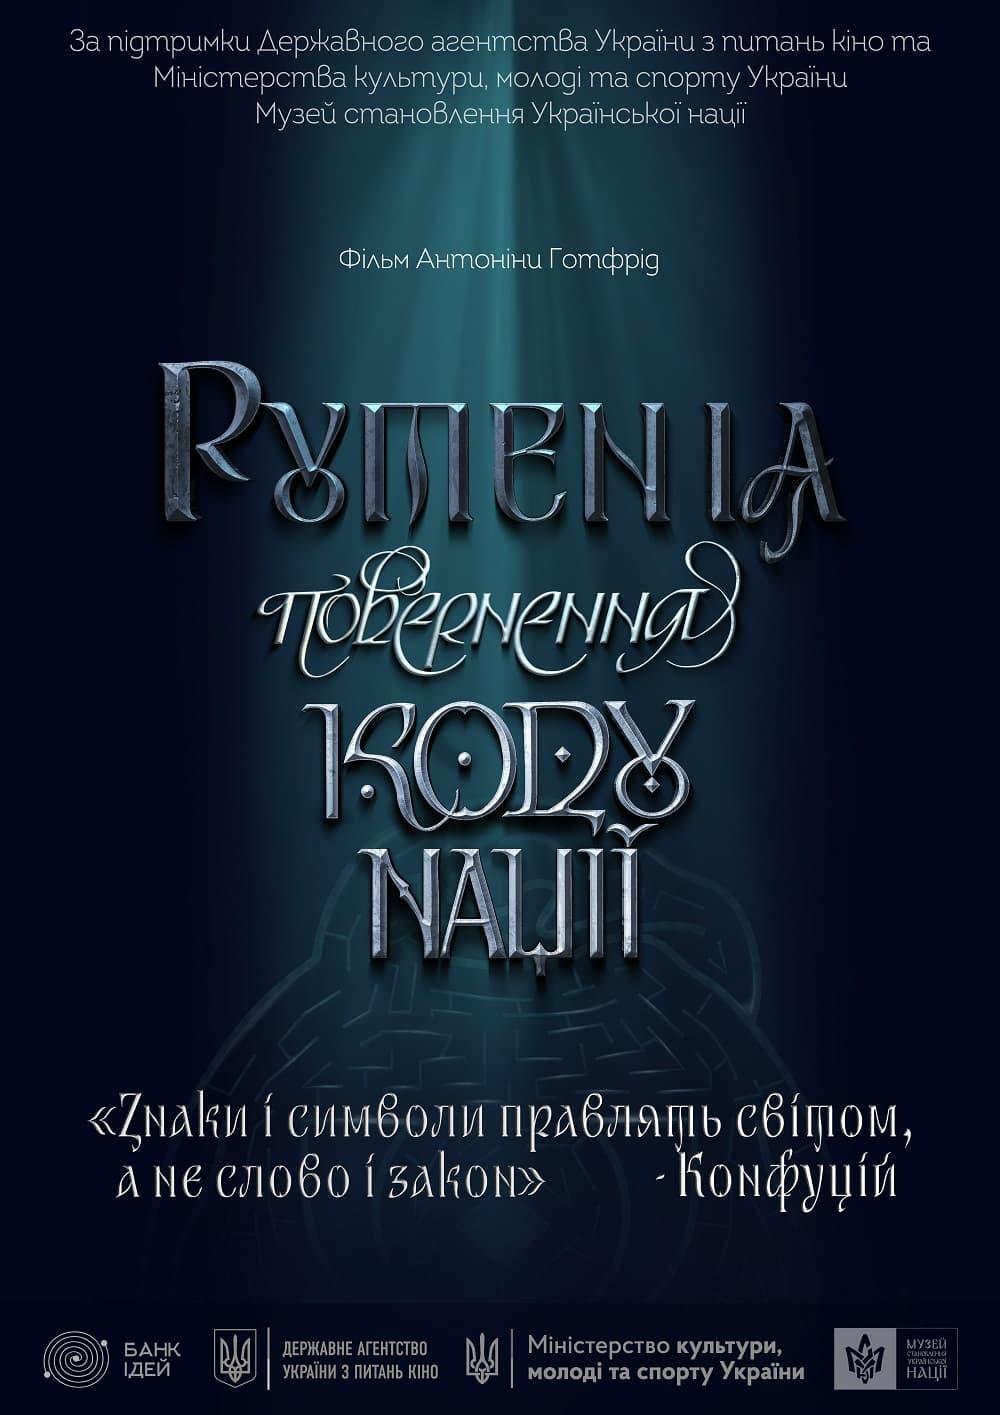 https://www.cinema.in.ua/wp-content/uploads/2020/08/5f3faaba6ad6e-ruteniya-1-1